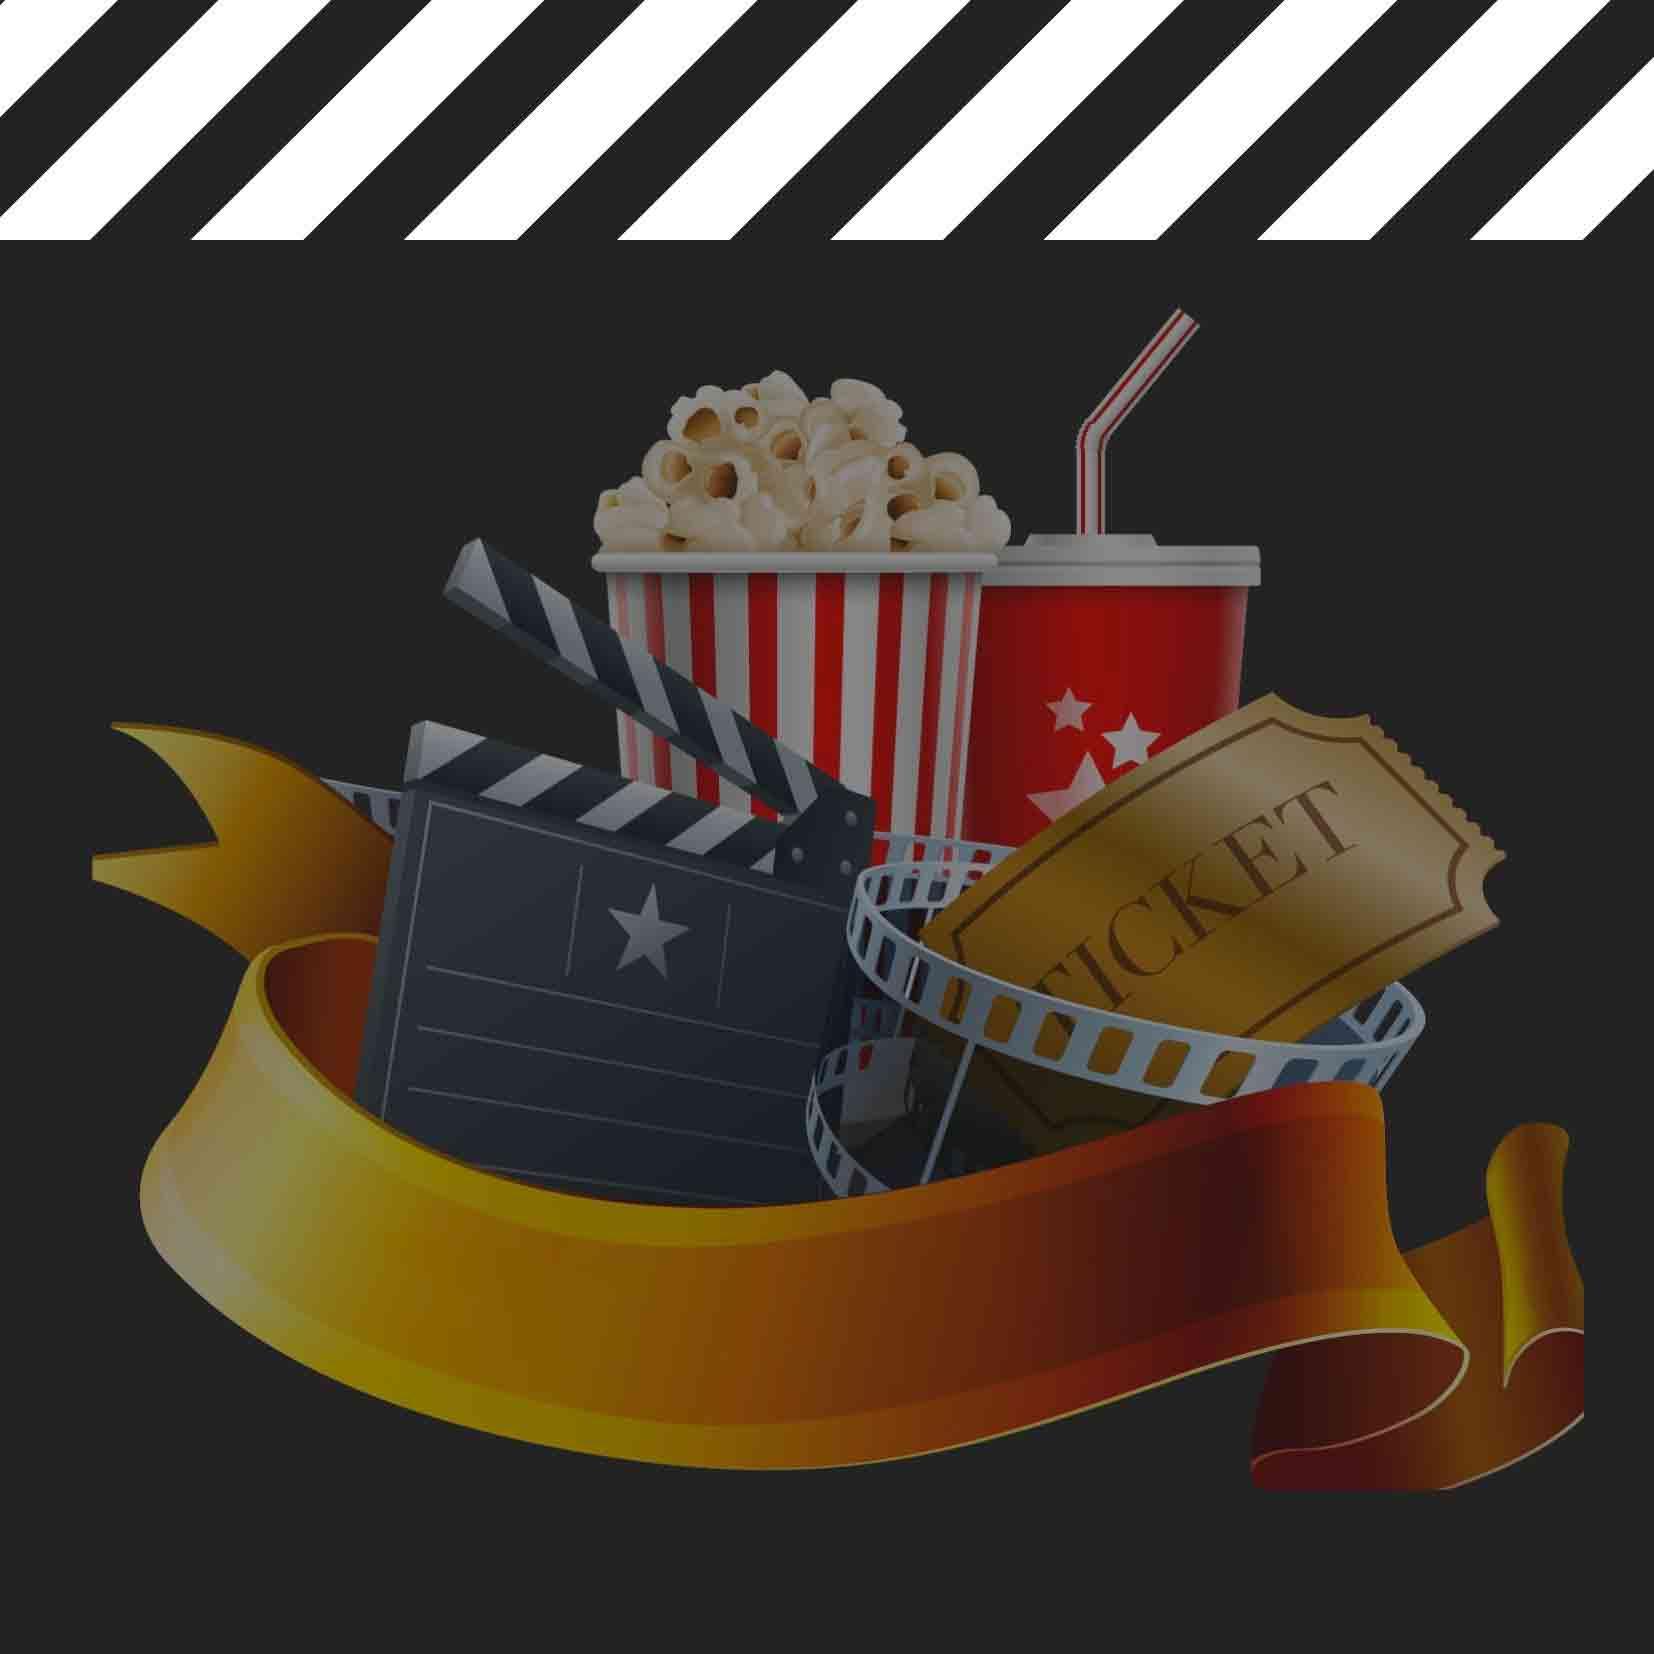 Popcorn, soda, cinéma